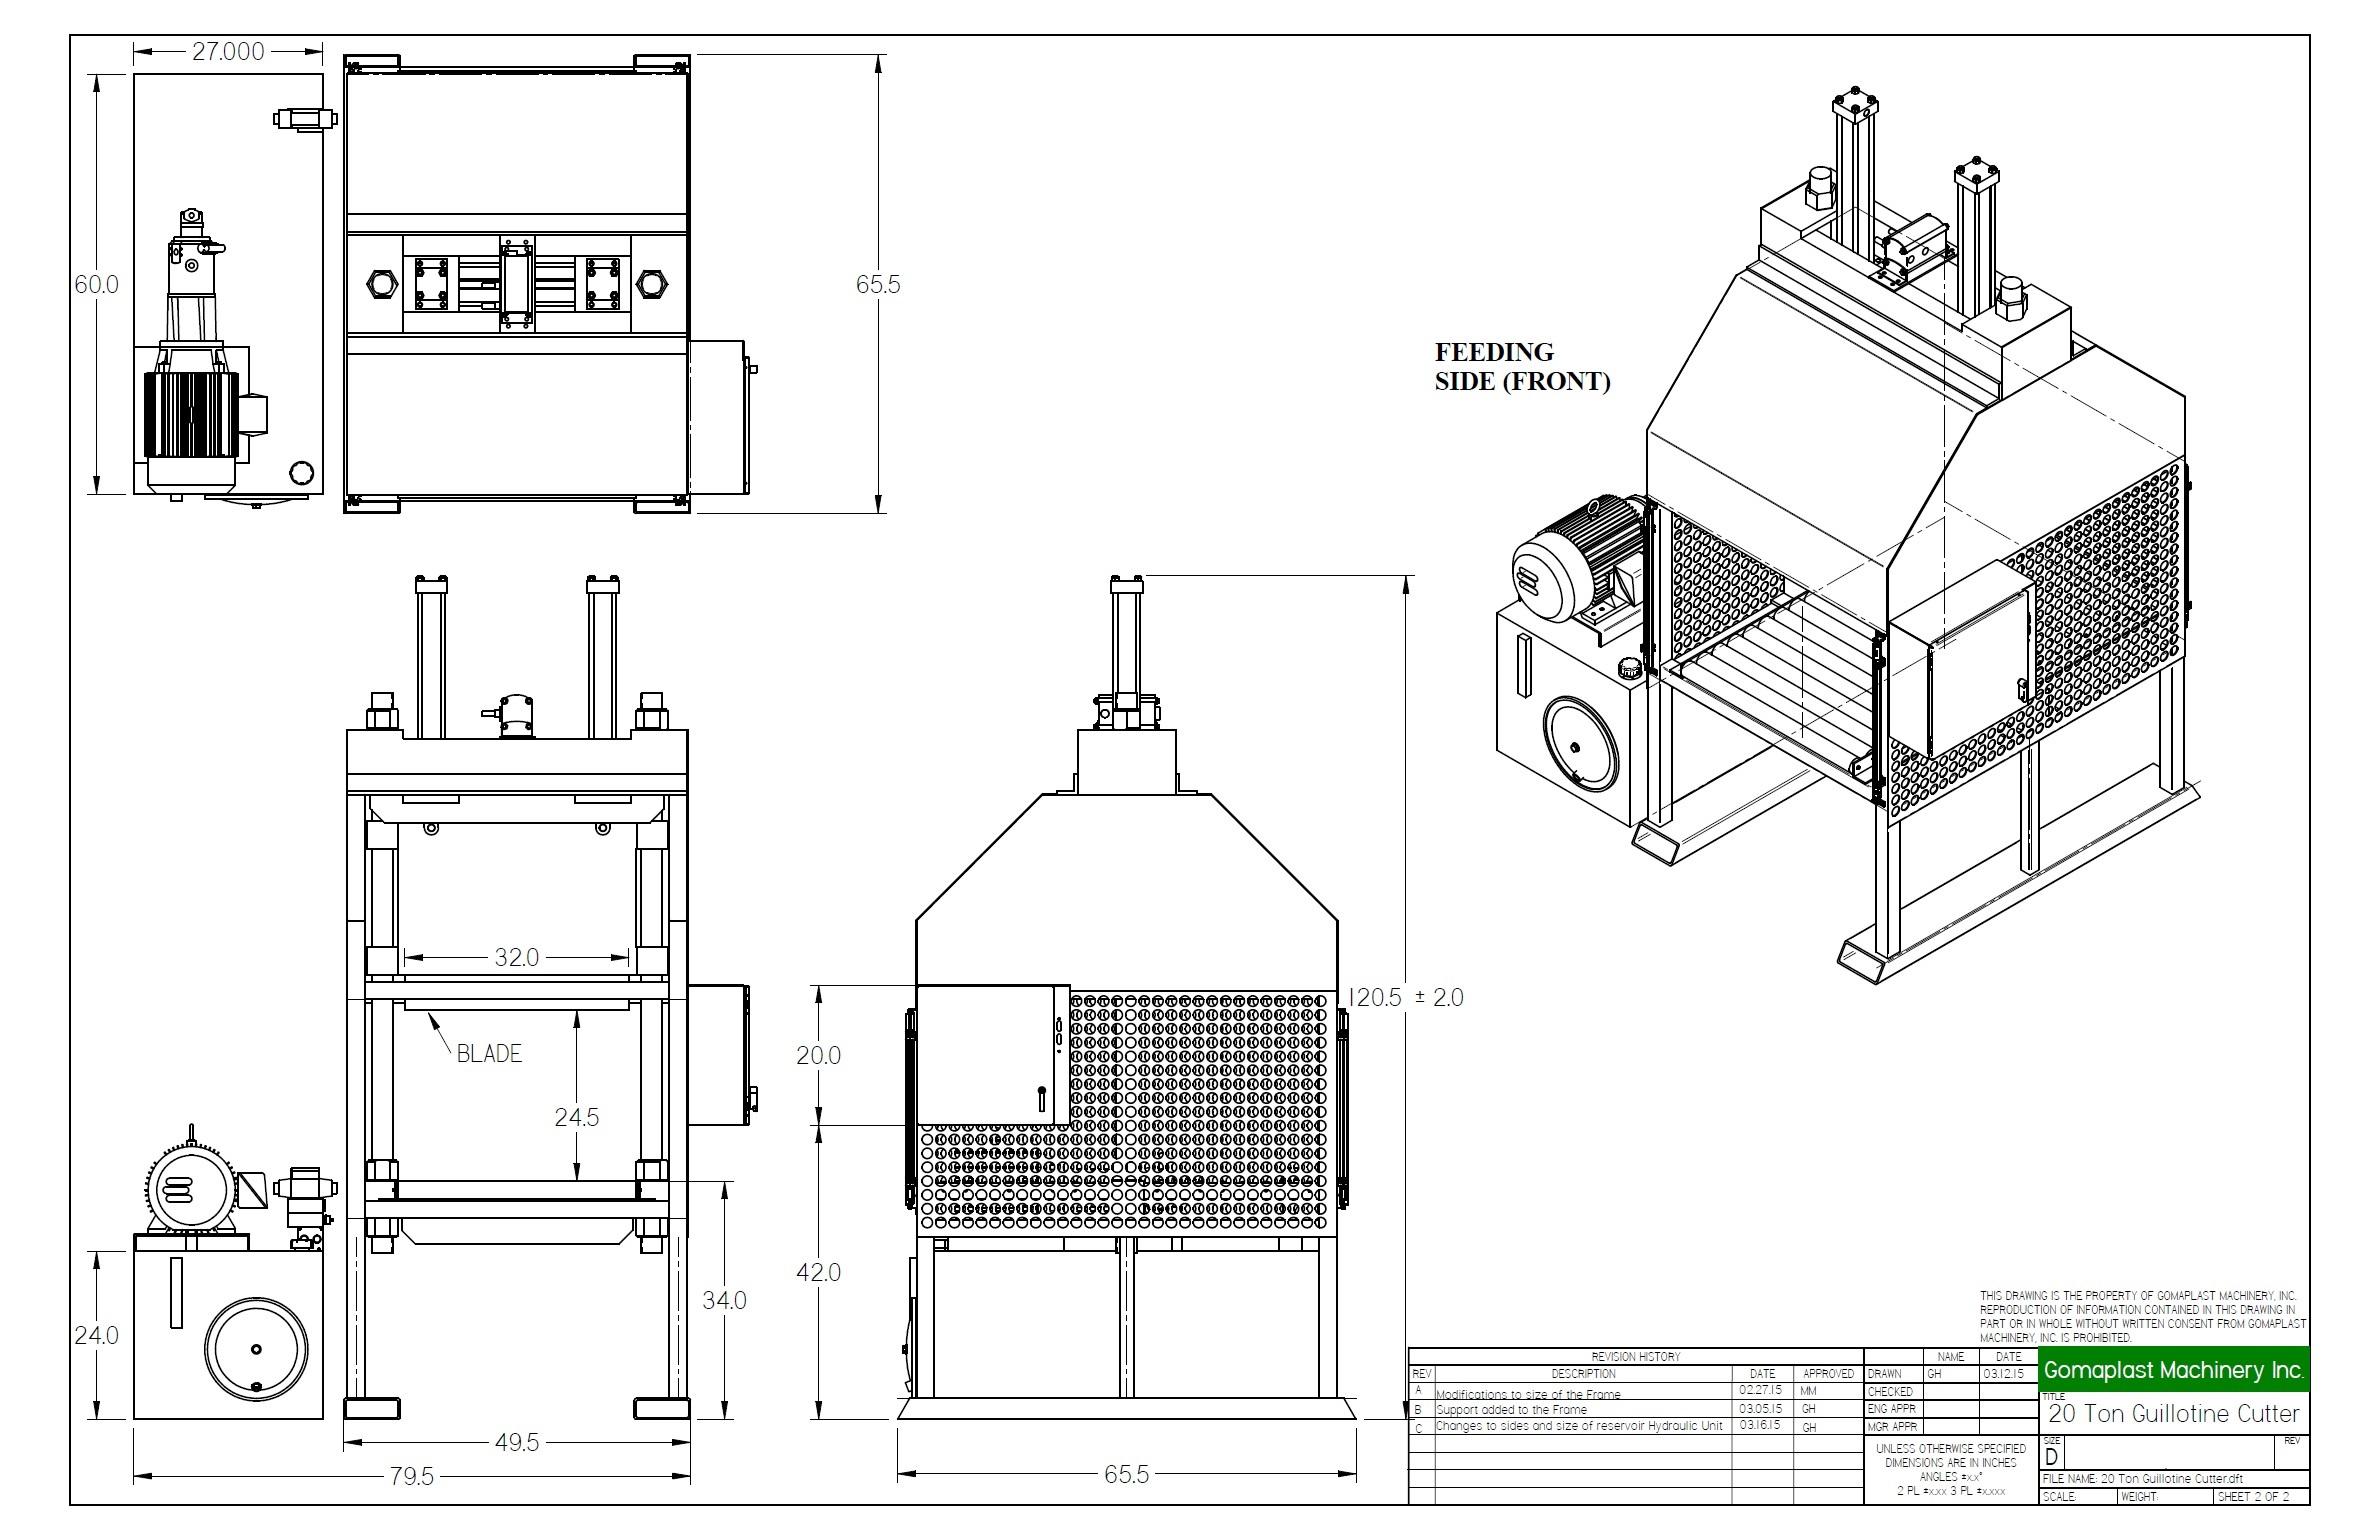 design spare parts complete machine manufacturing line